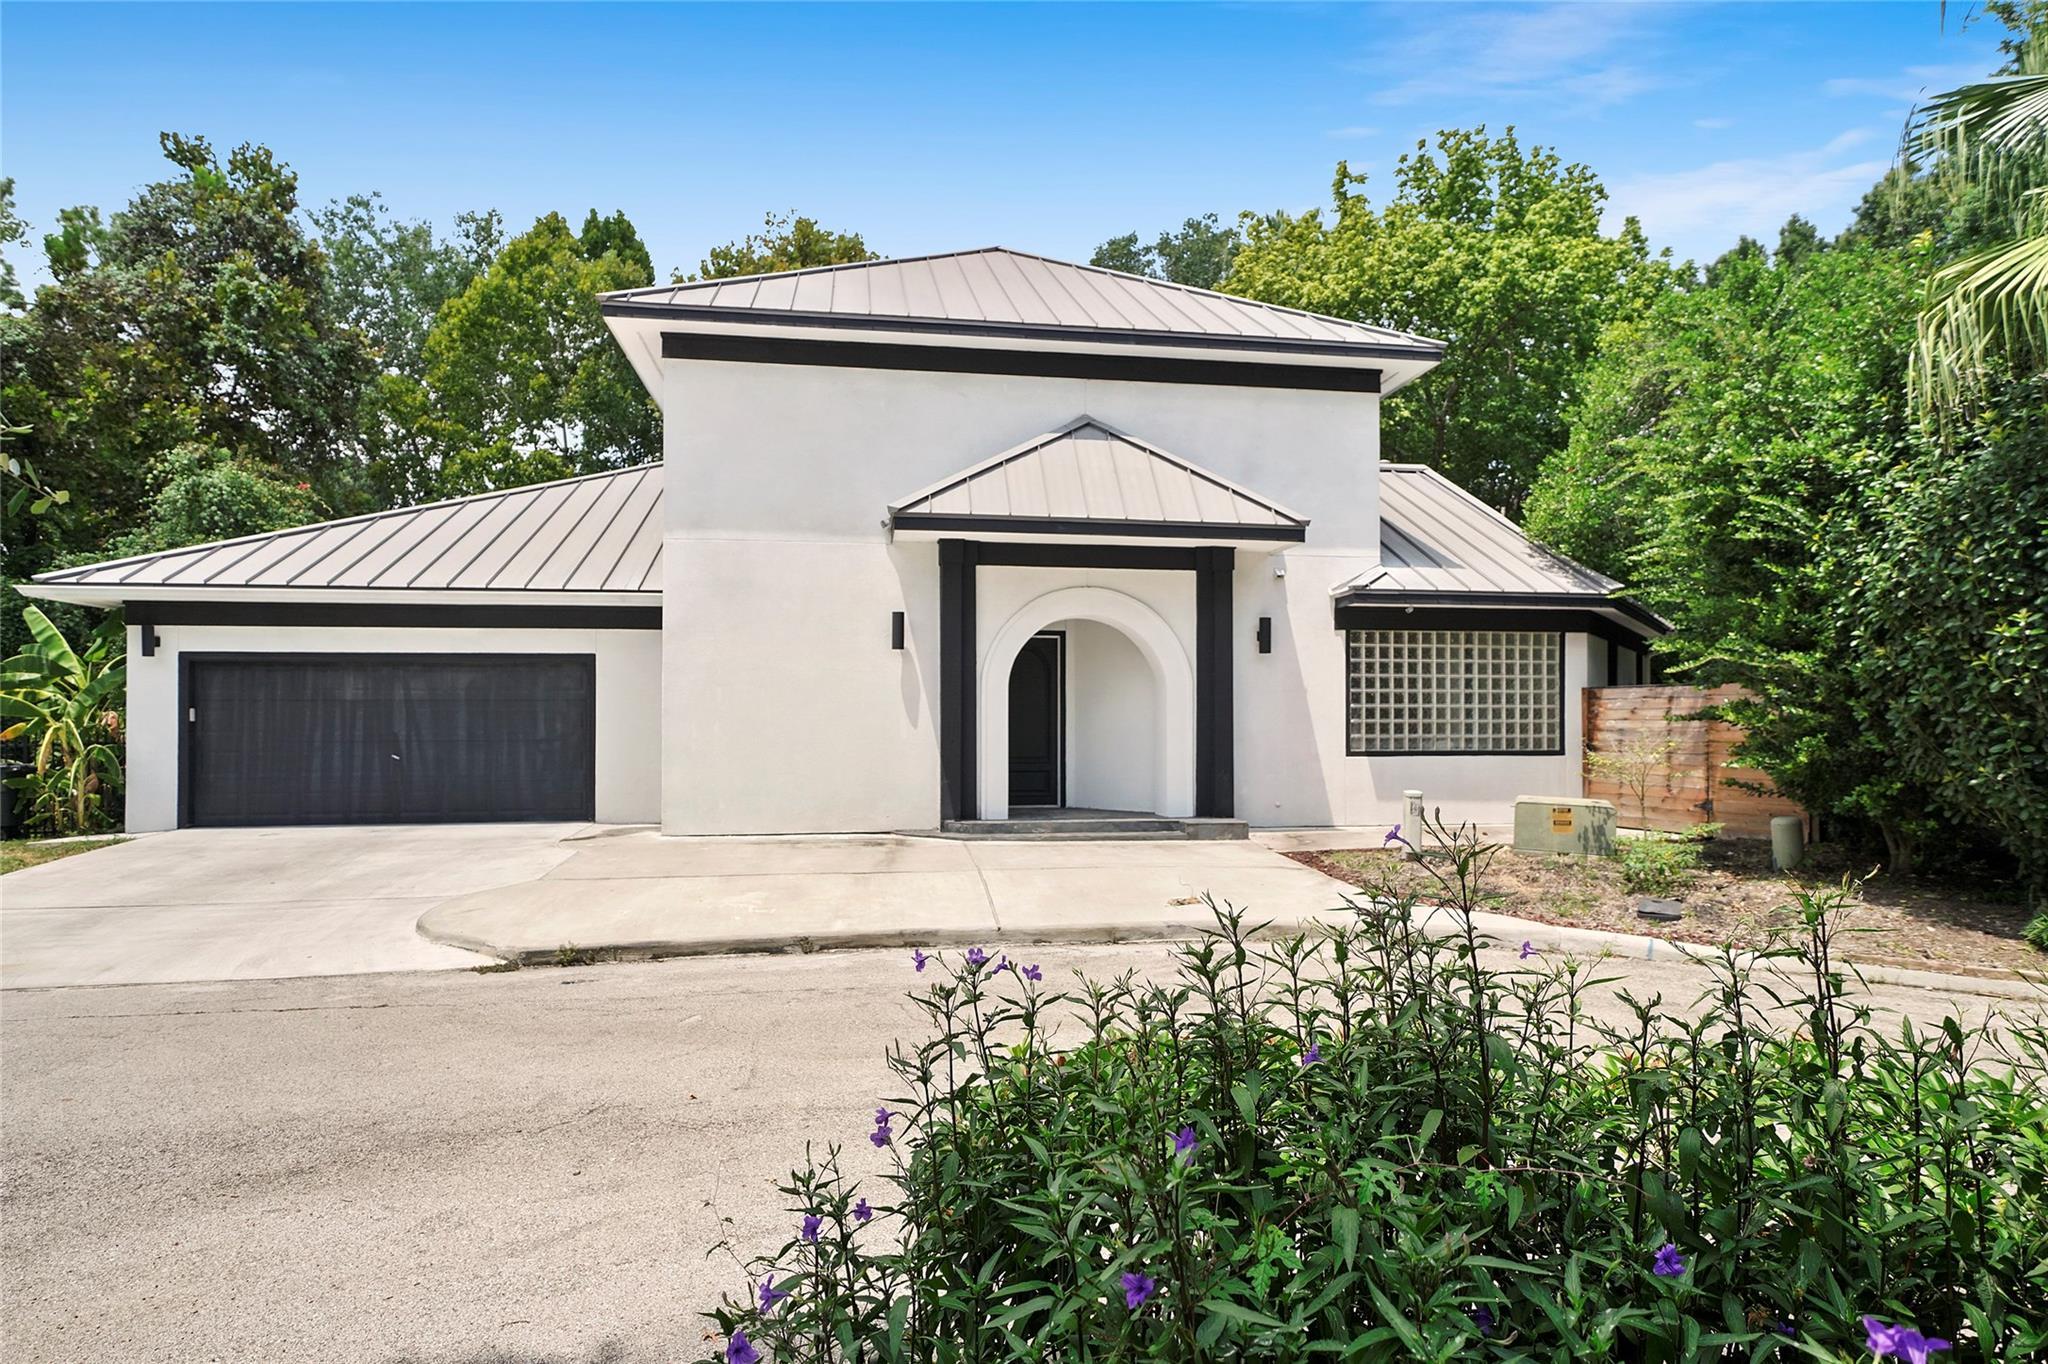 15 W Shady Lane #H Property Photo - Houston, TX real estate listing